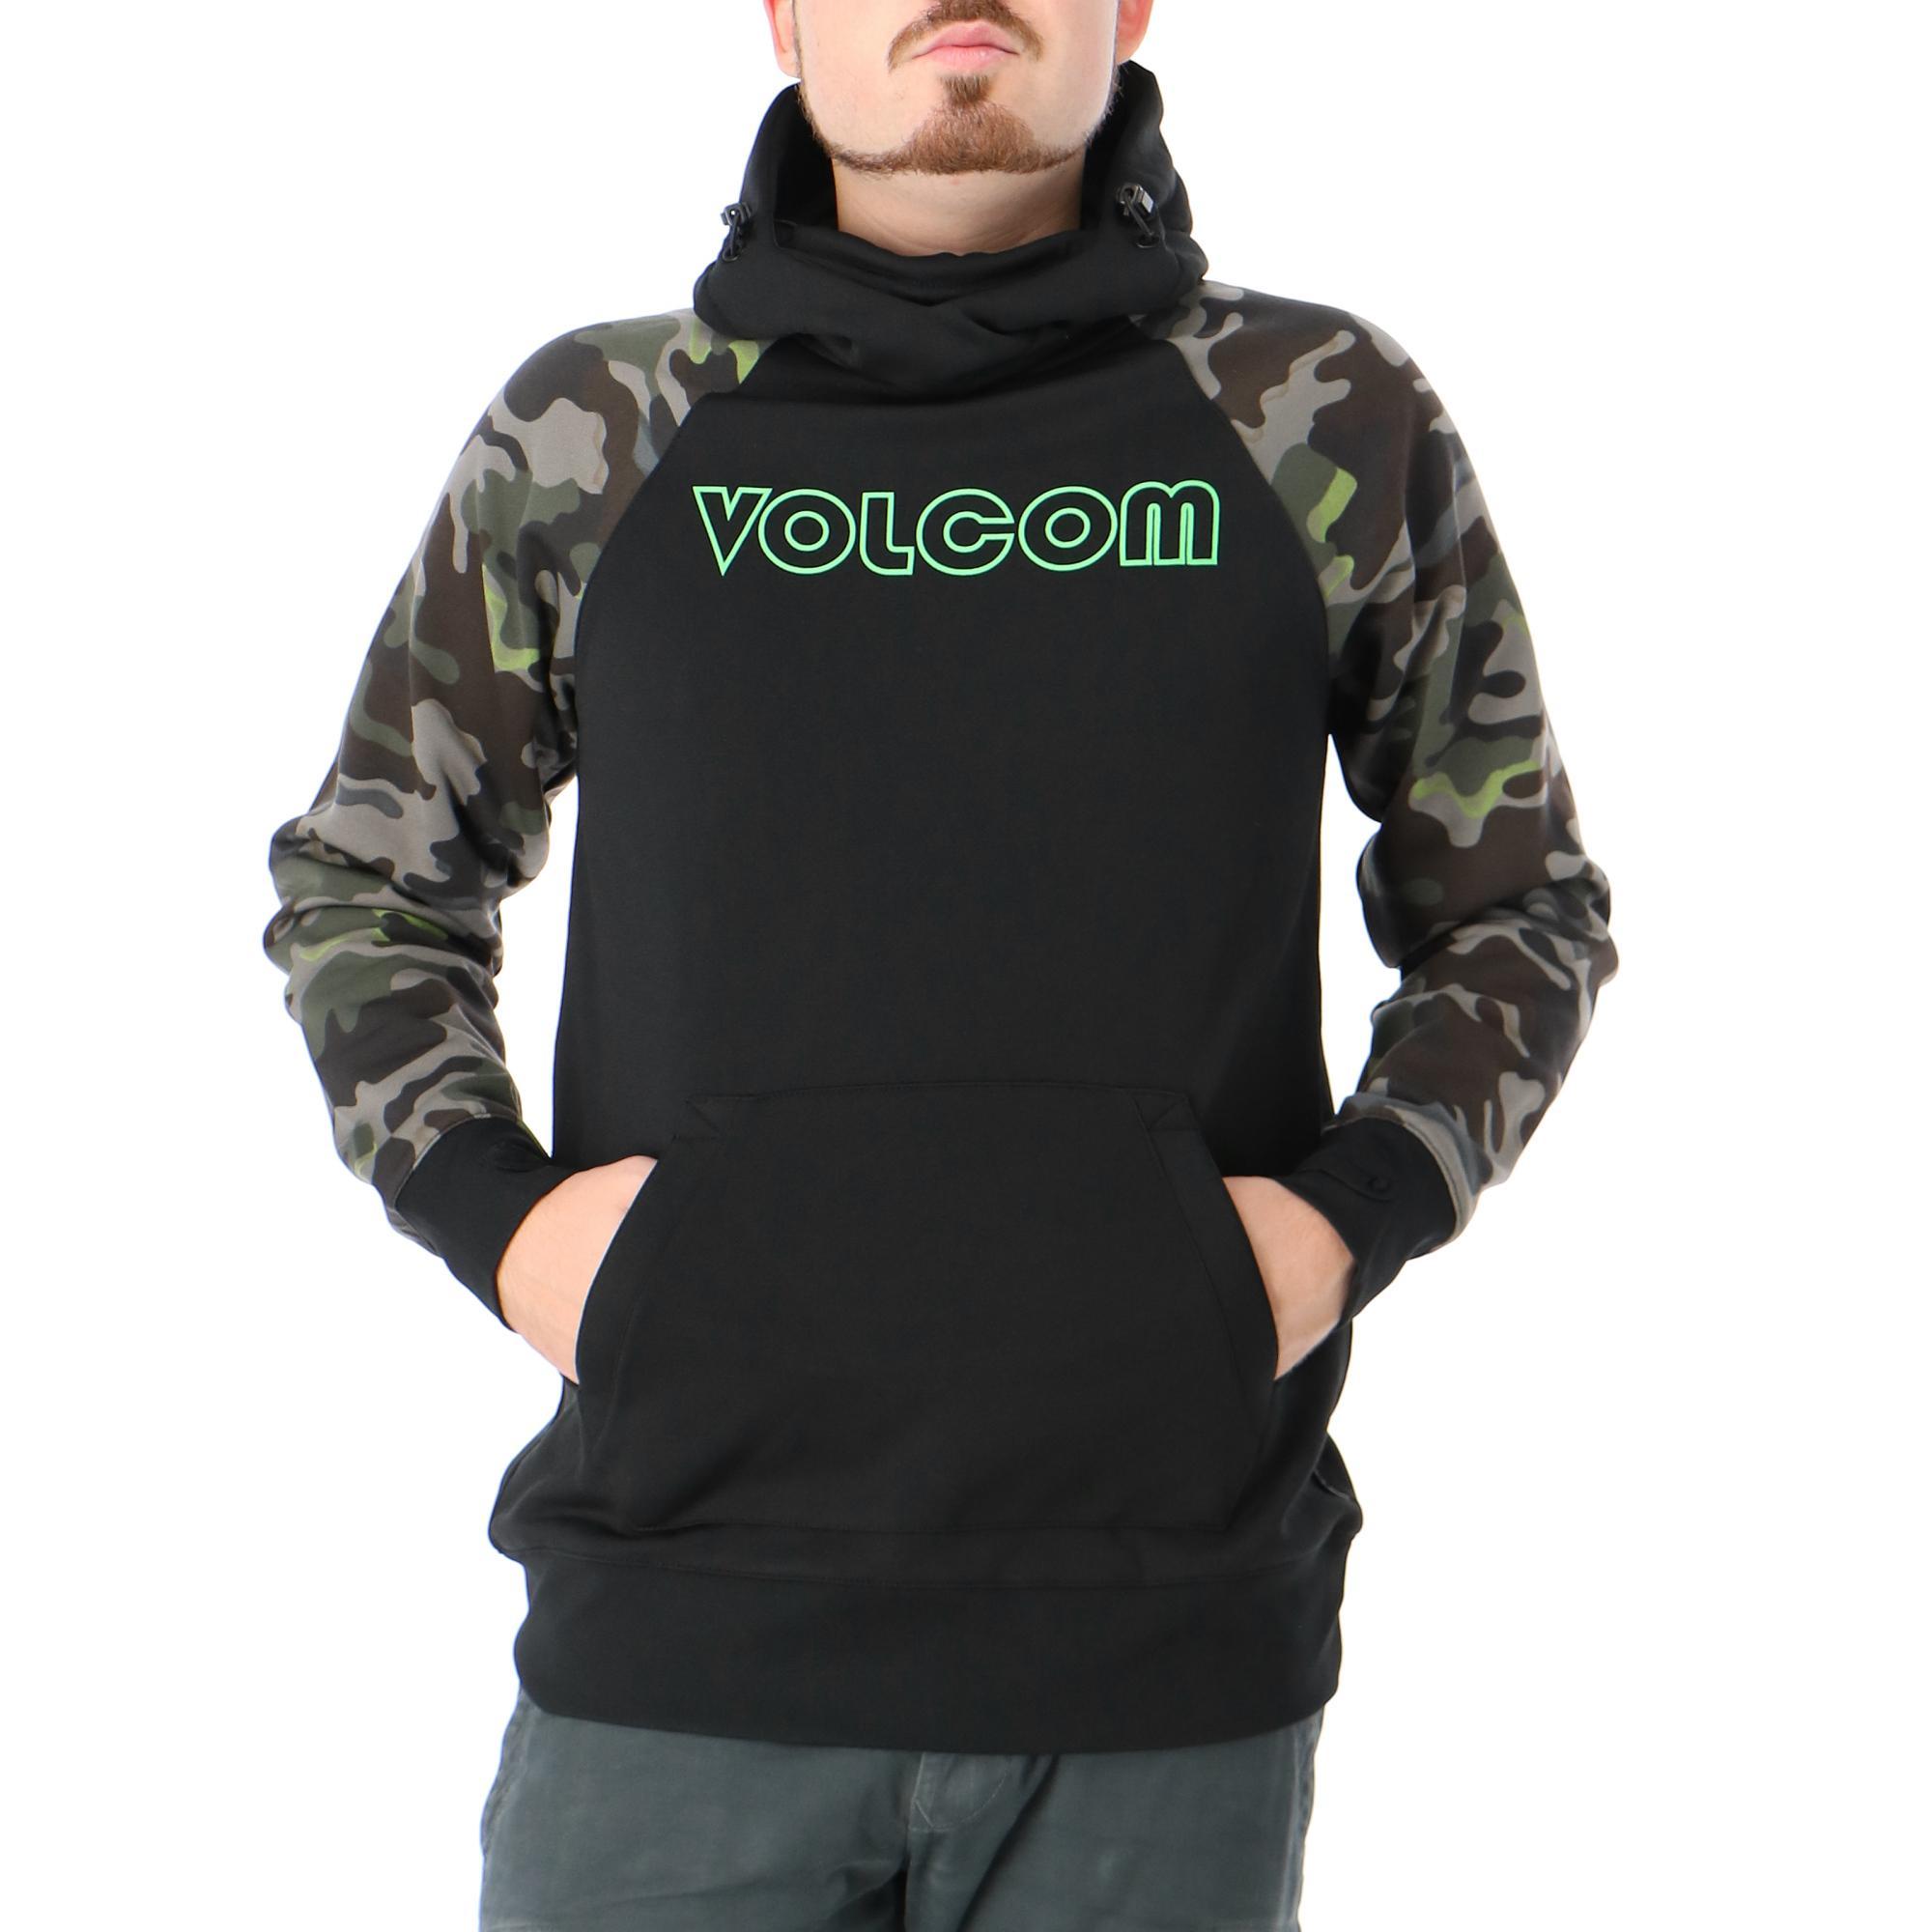 Volcom Hydro Riding Hoodie ARMY